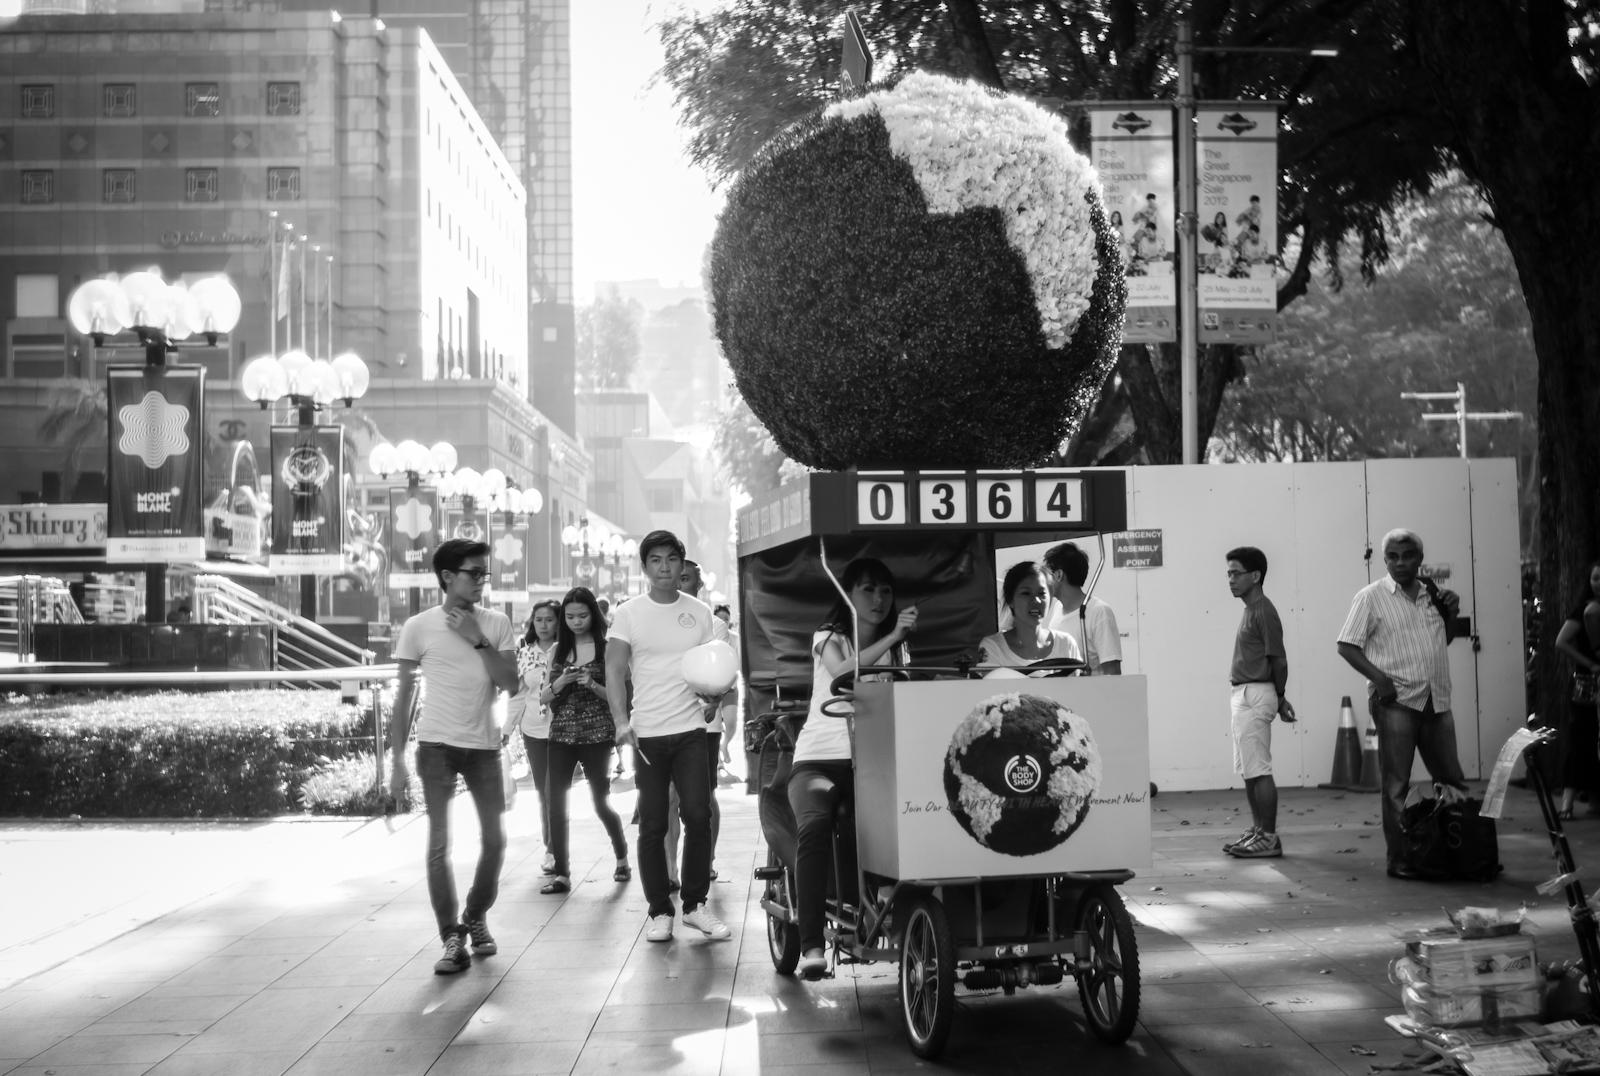 Street photography - Body Shop promotion